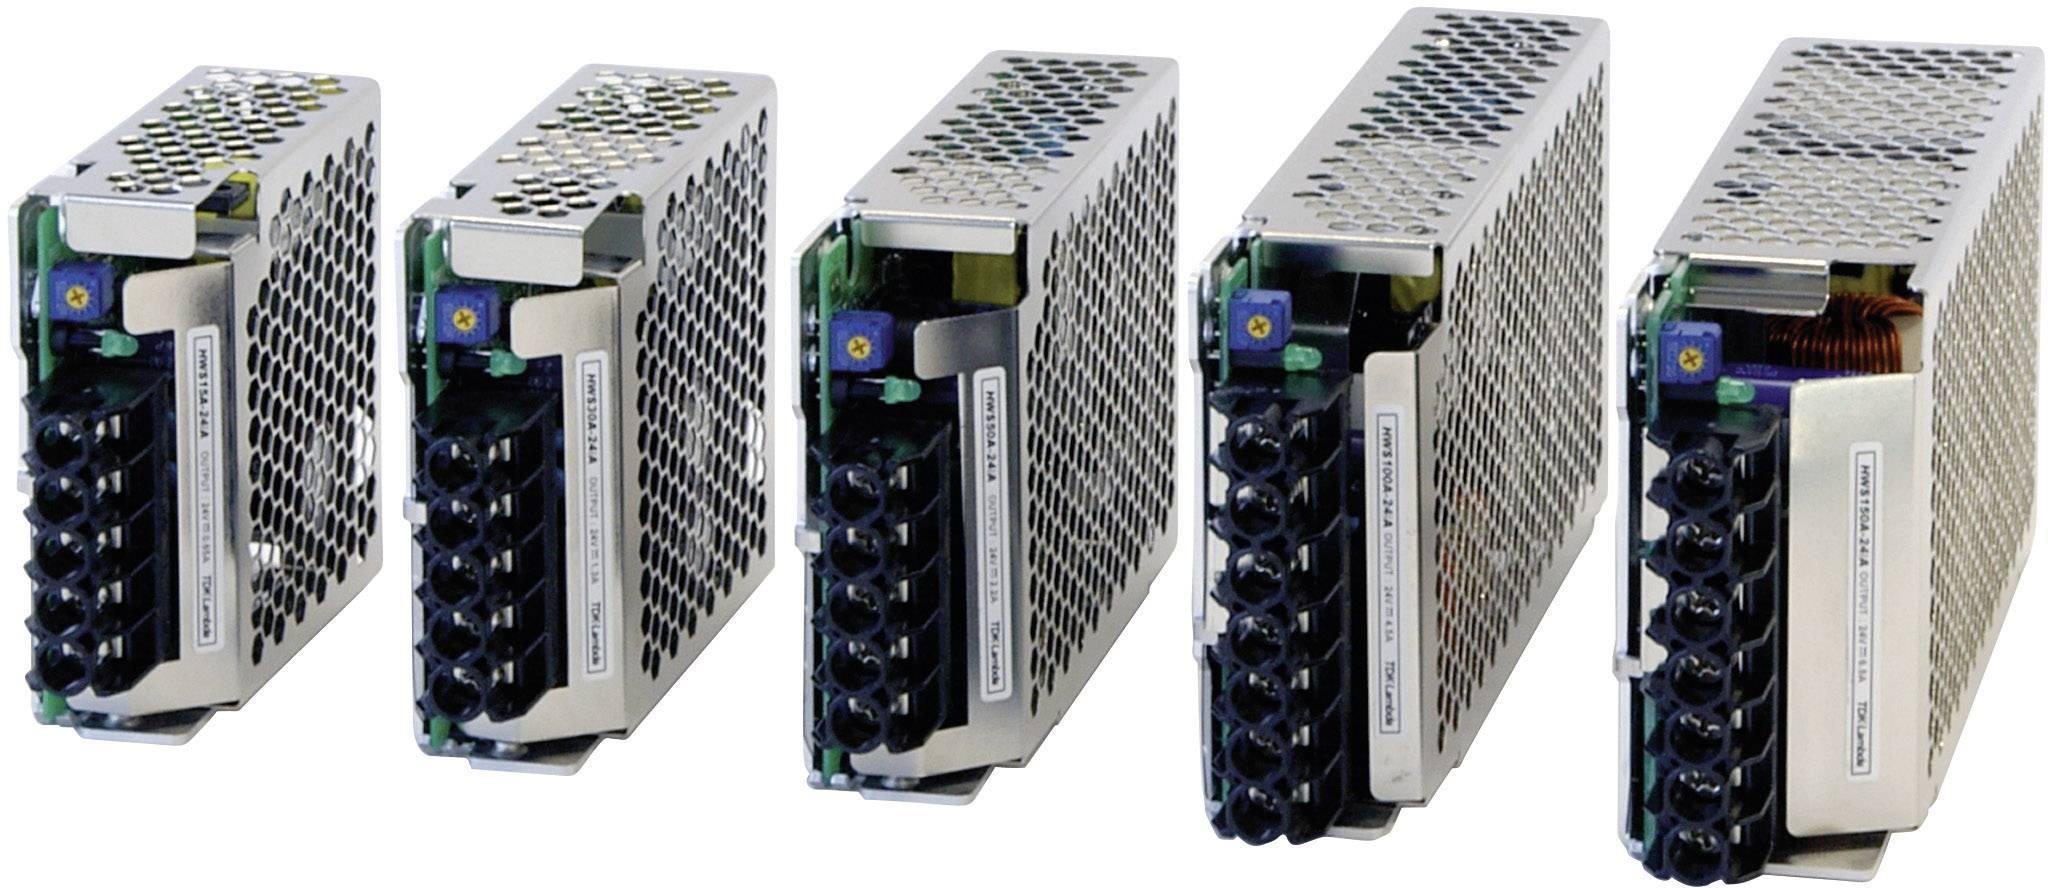 Zabudovateľný napájací zdroj TDK-Lambda HWS-50A-5/A, 5 V, 50 W